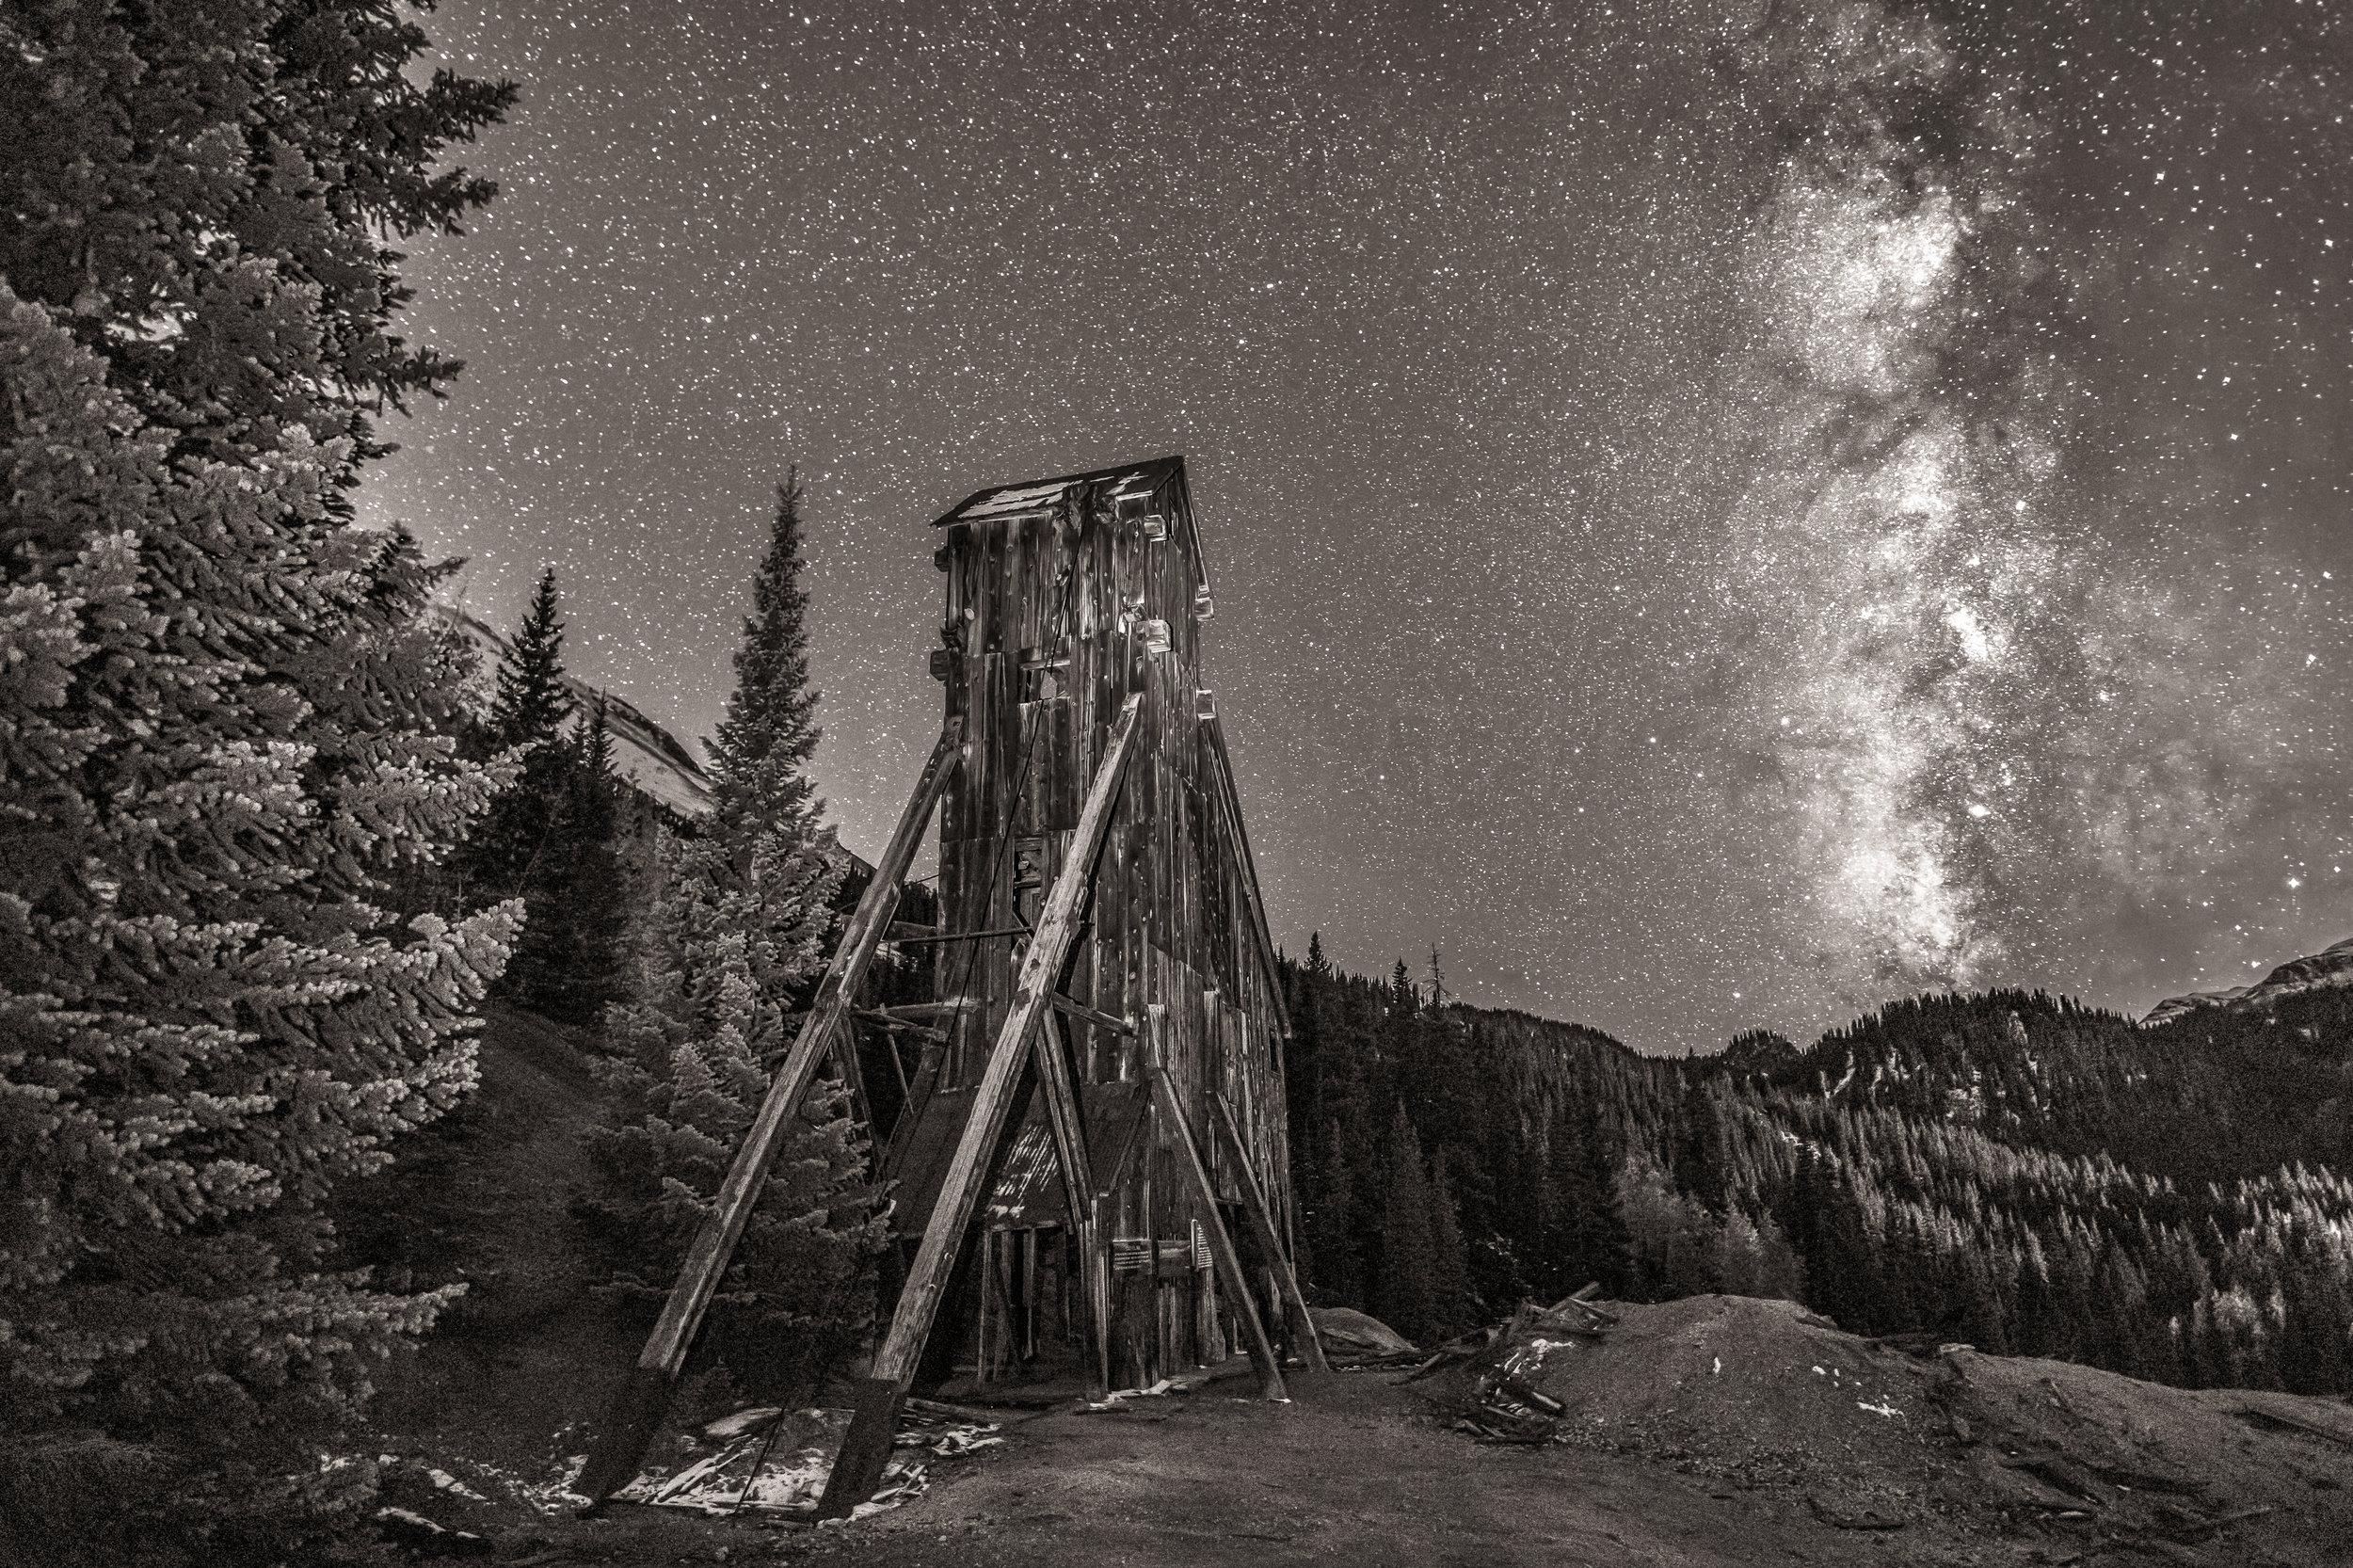 Milky way over Yankee Girl Mine, Image # 5553